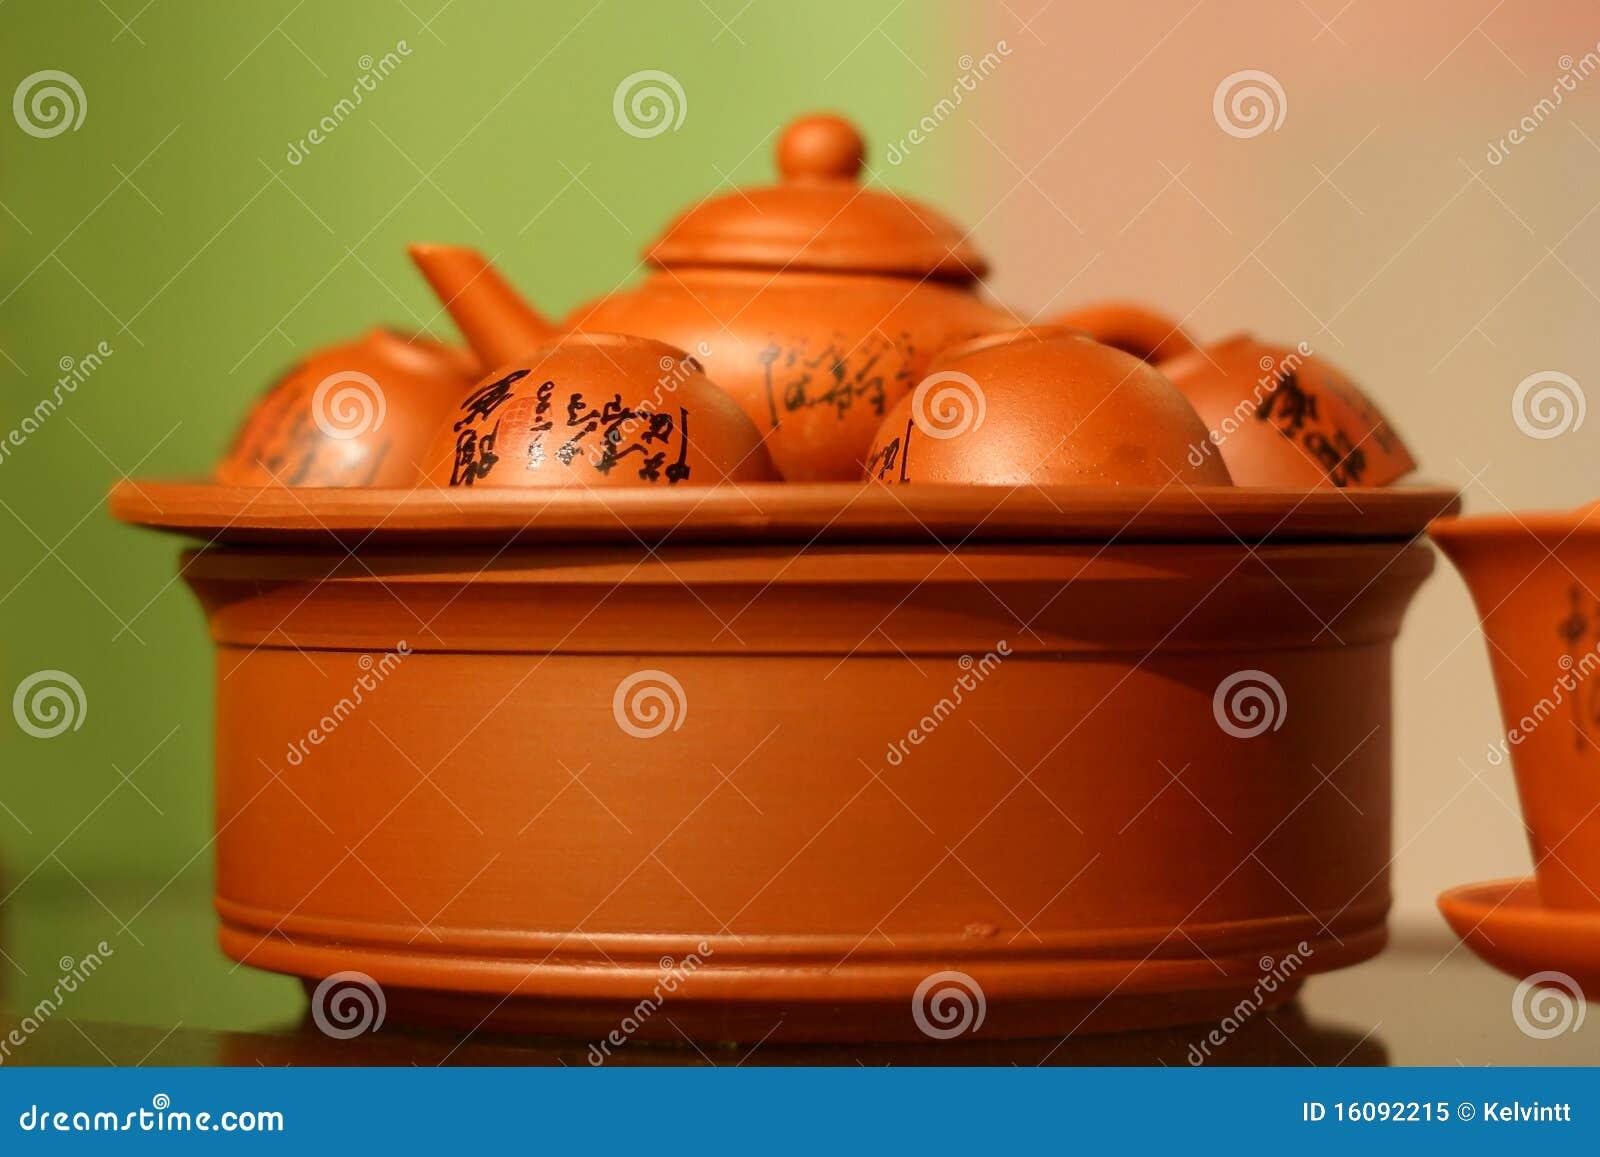 Chinese Tea Set Royalty Free Stock Photo Image 16092215